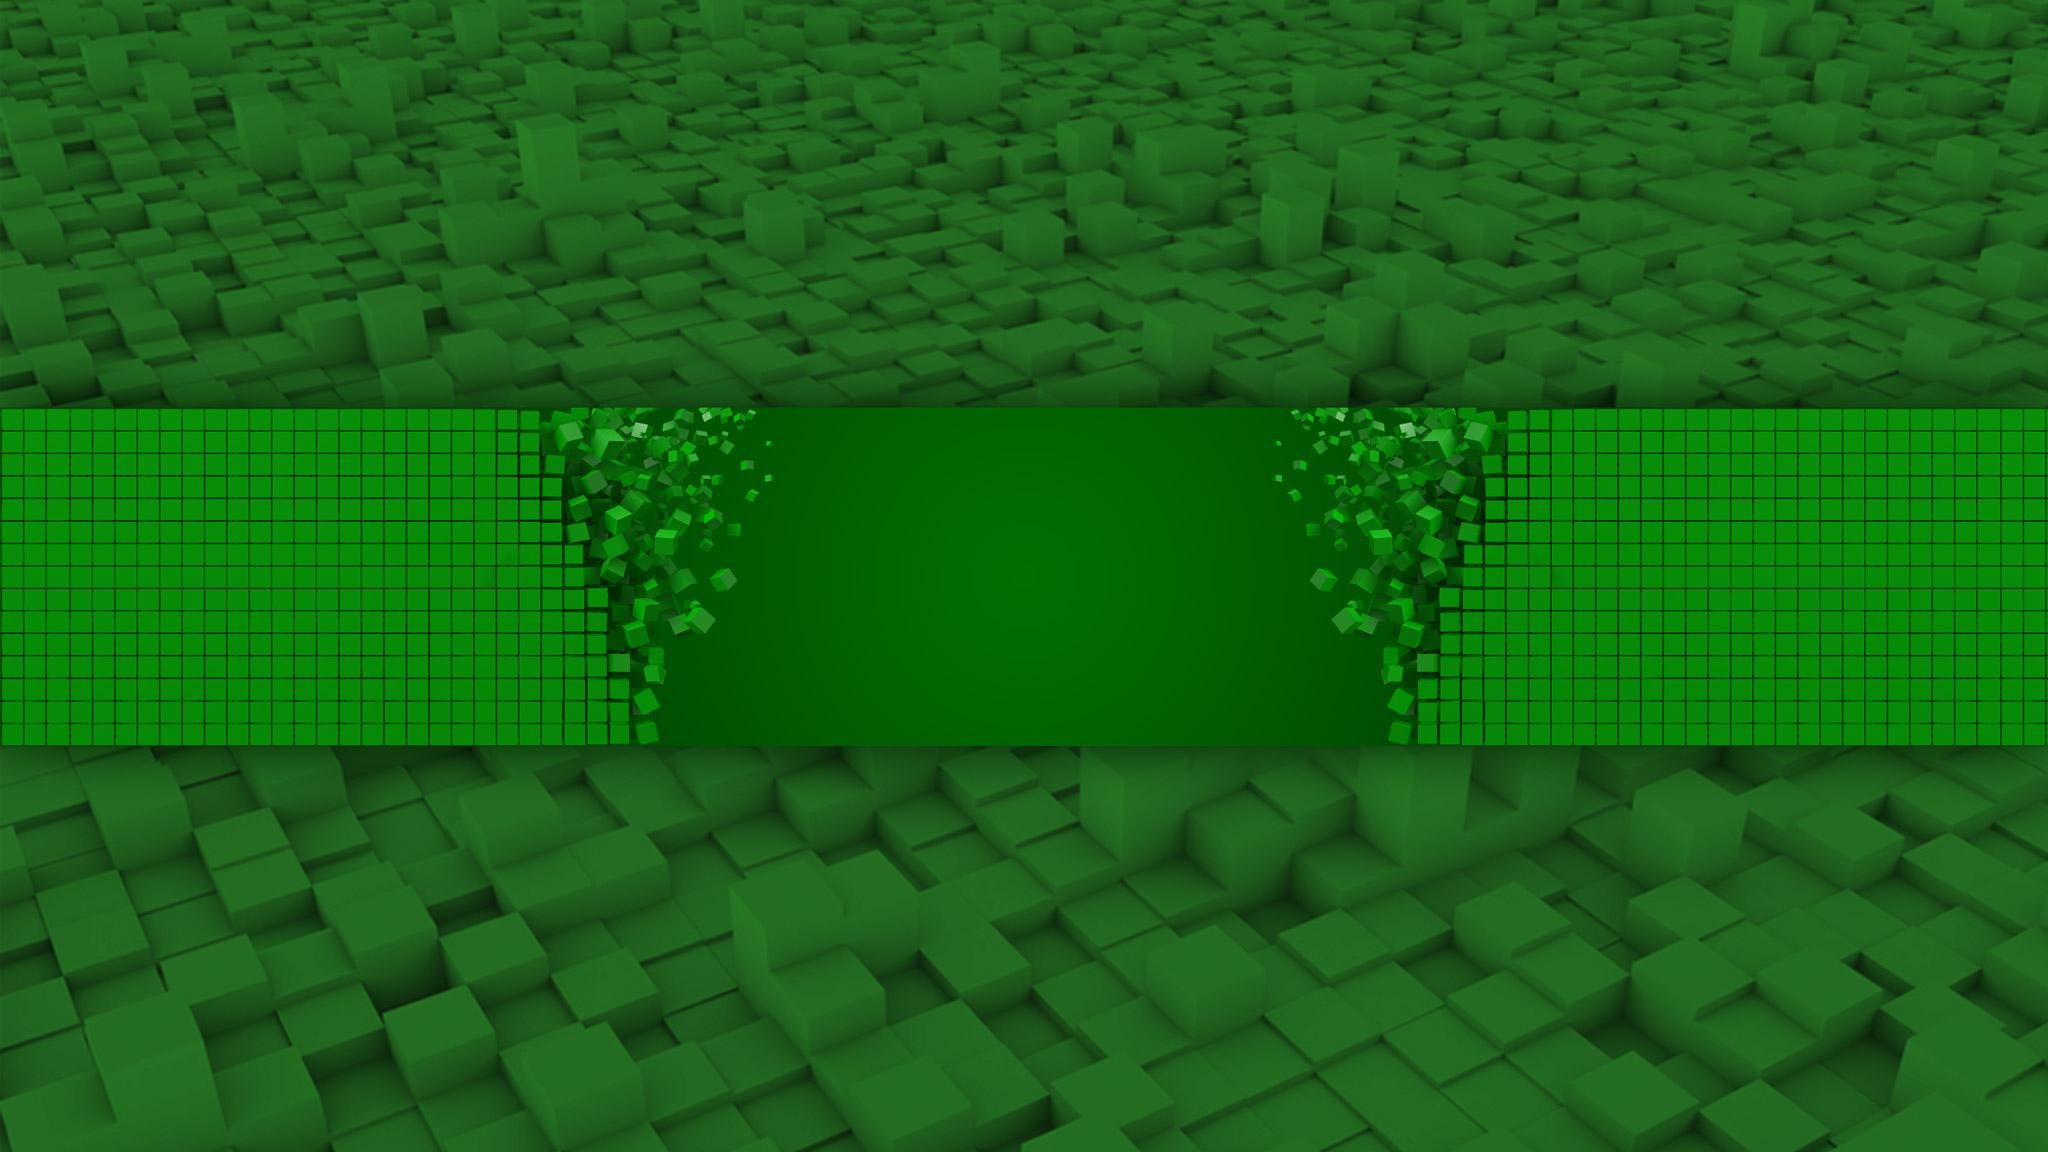 Картинка зелёный фон для шапки на youtube майнкрафт с симметричными кубиками.